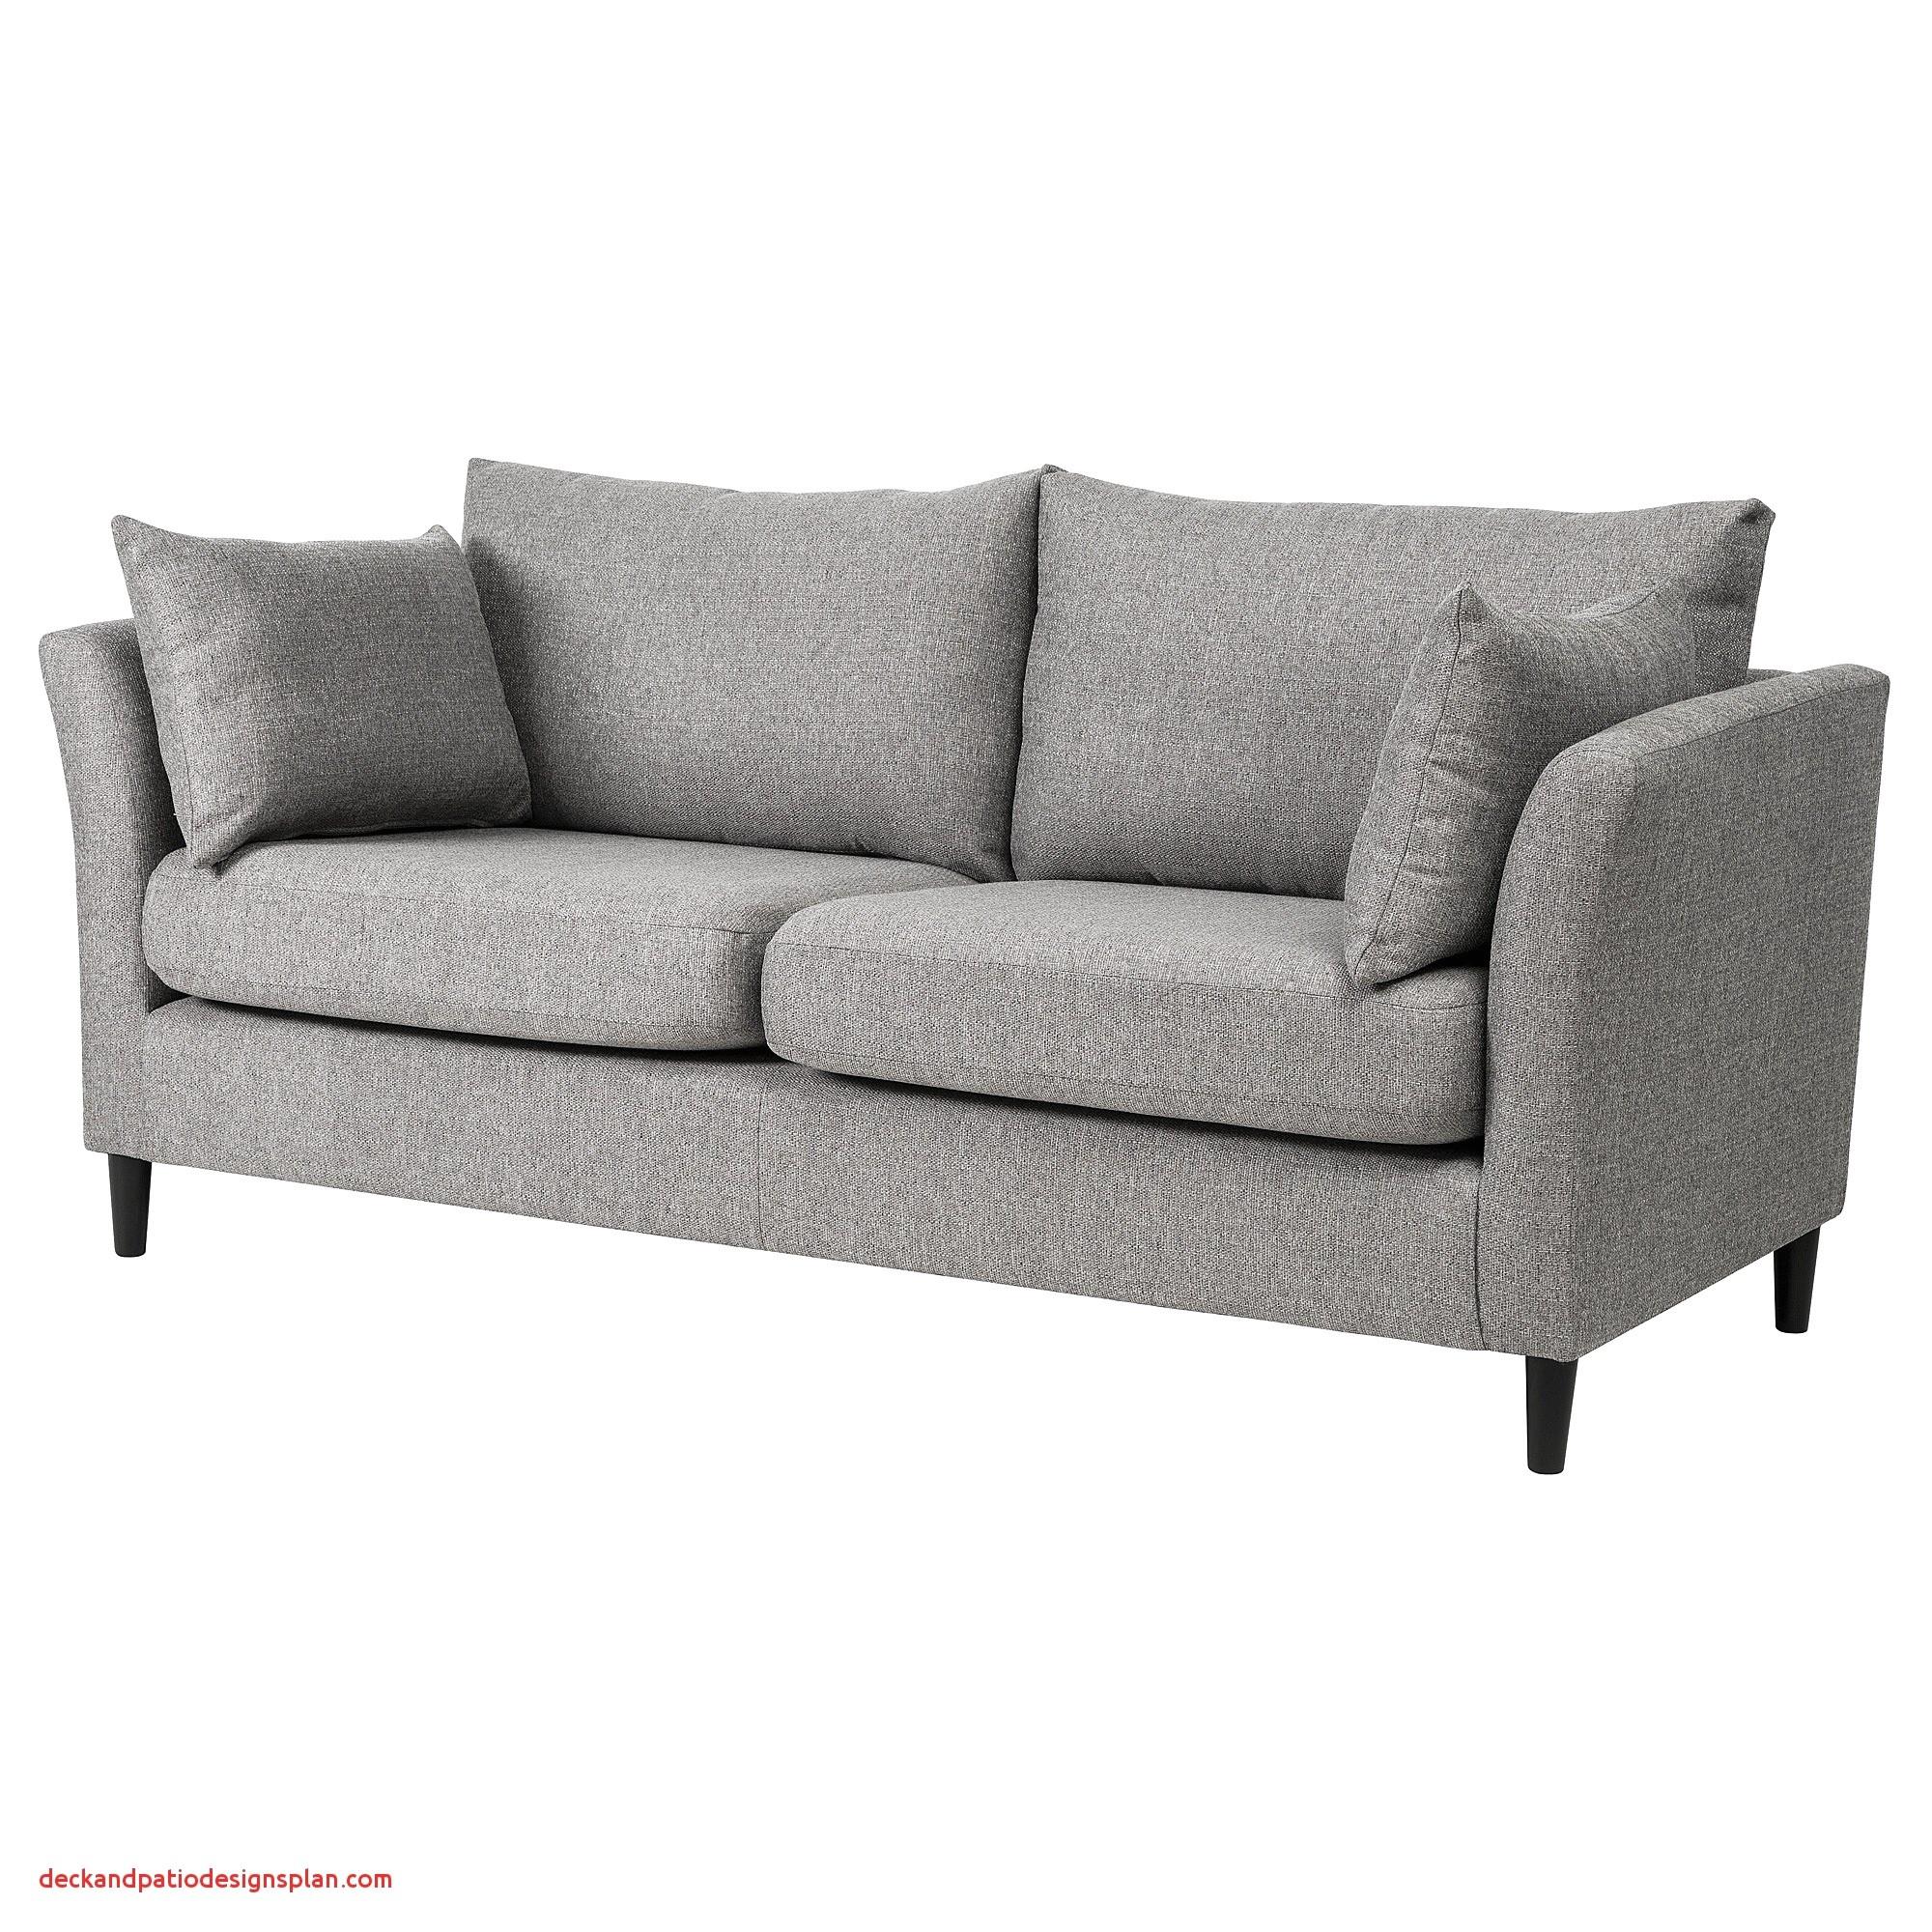 ikea karlstad schlafsofa neu ikea stockholm lampe sofa bed ikea usa lovely wicker outdoor sofa 0d